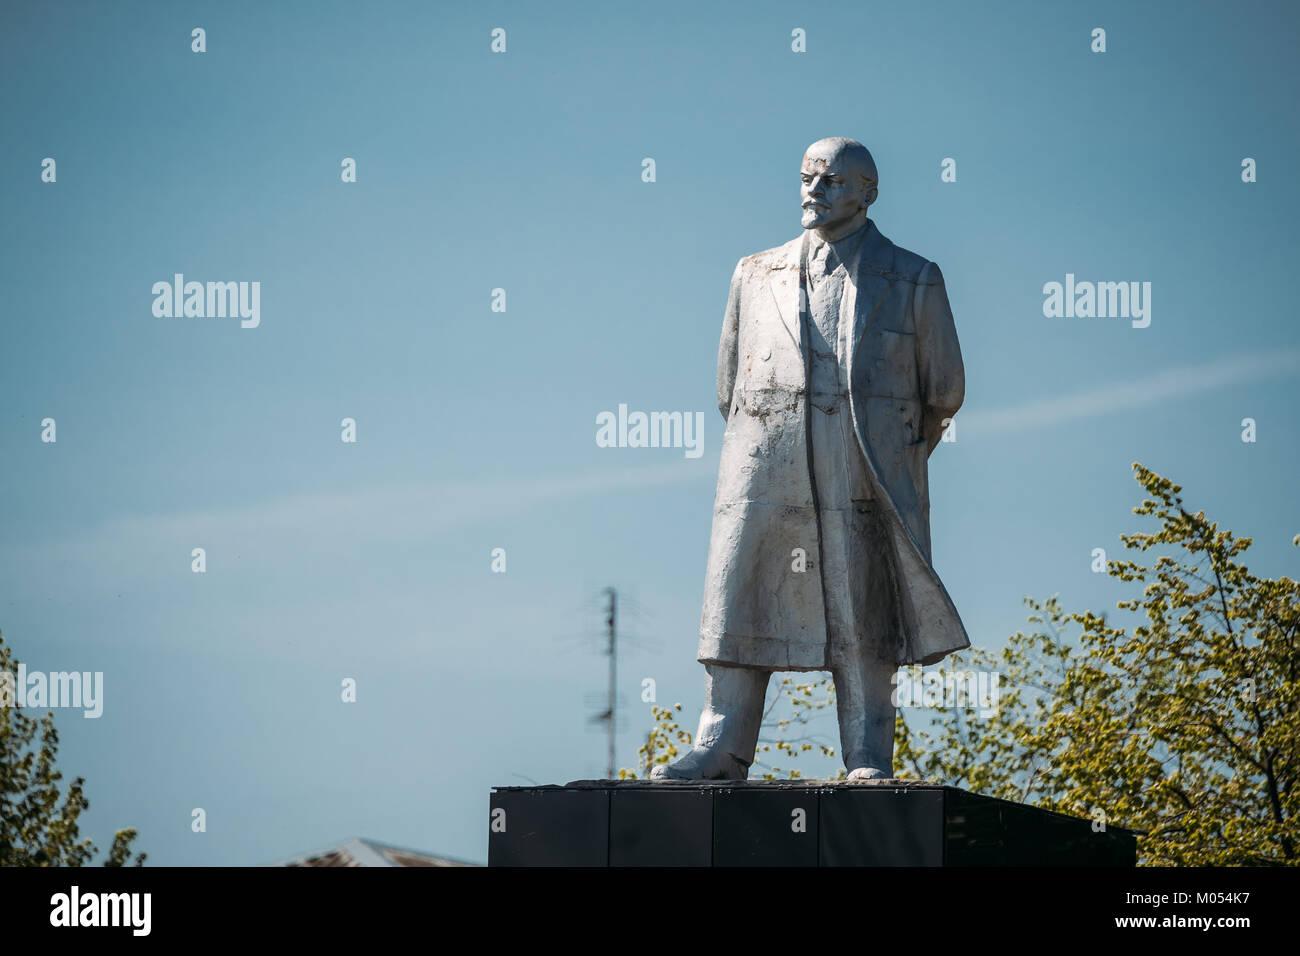 Dobrush, Belarus. Statue Of Vladimir Lenin In Lenin Square Stock Photo